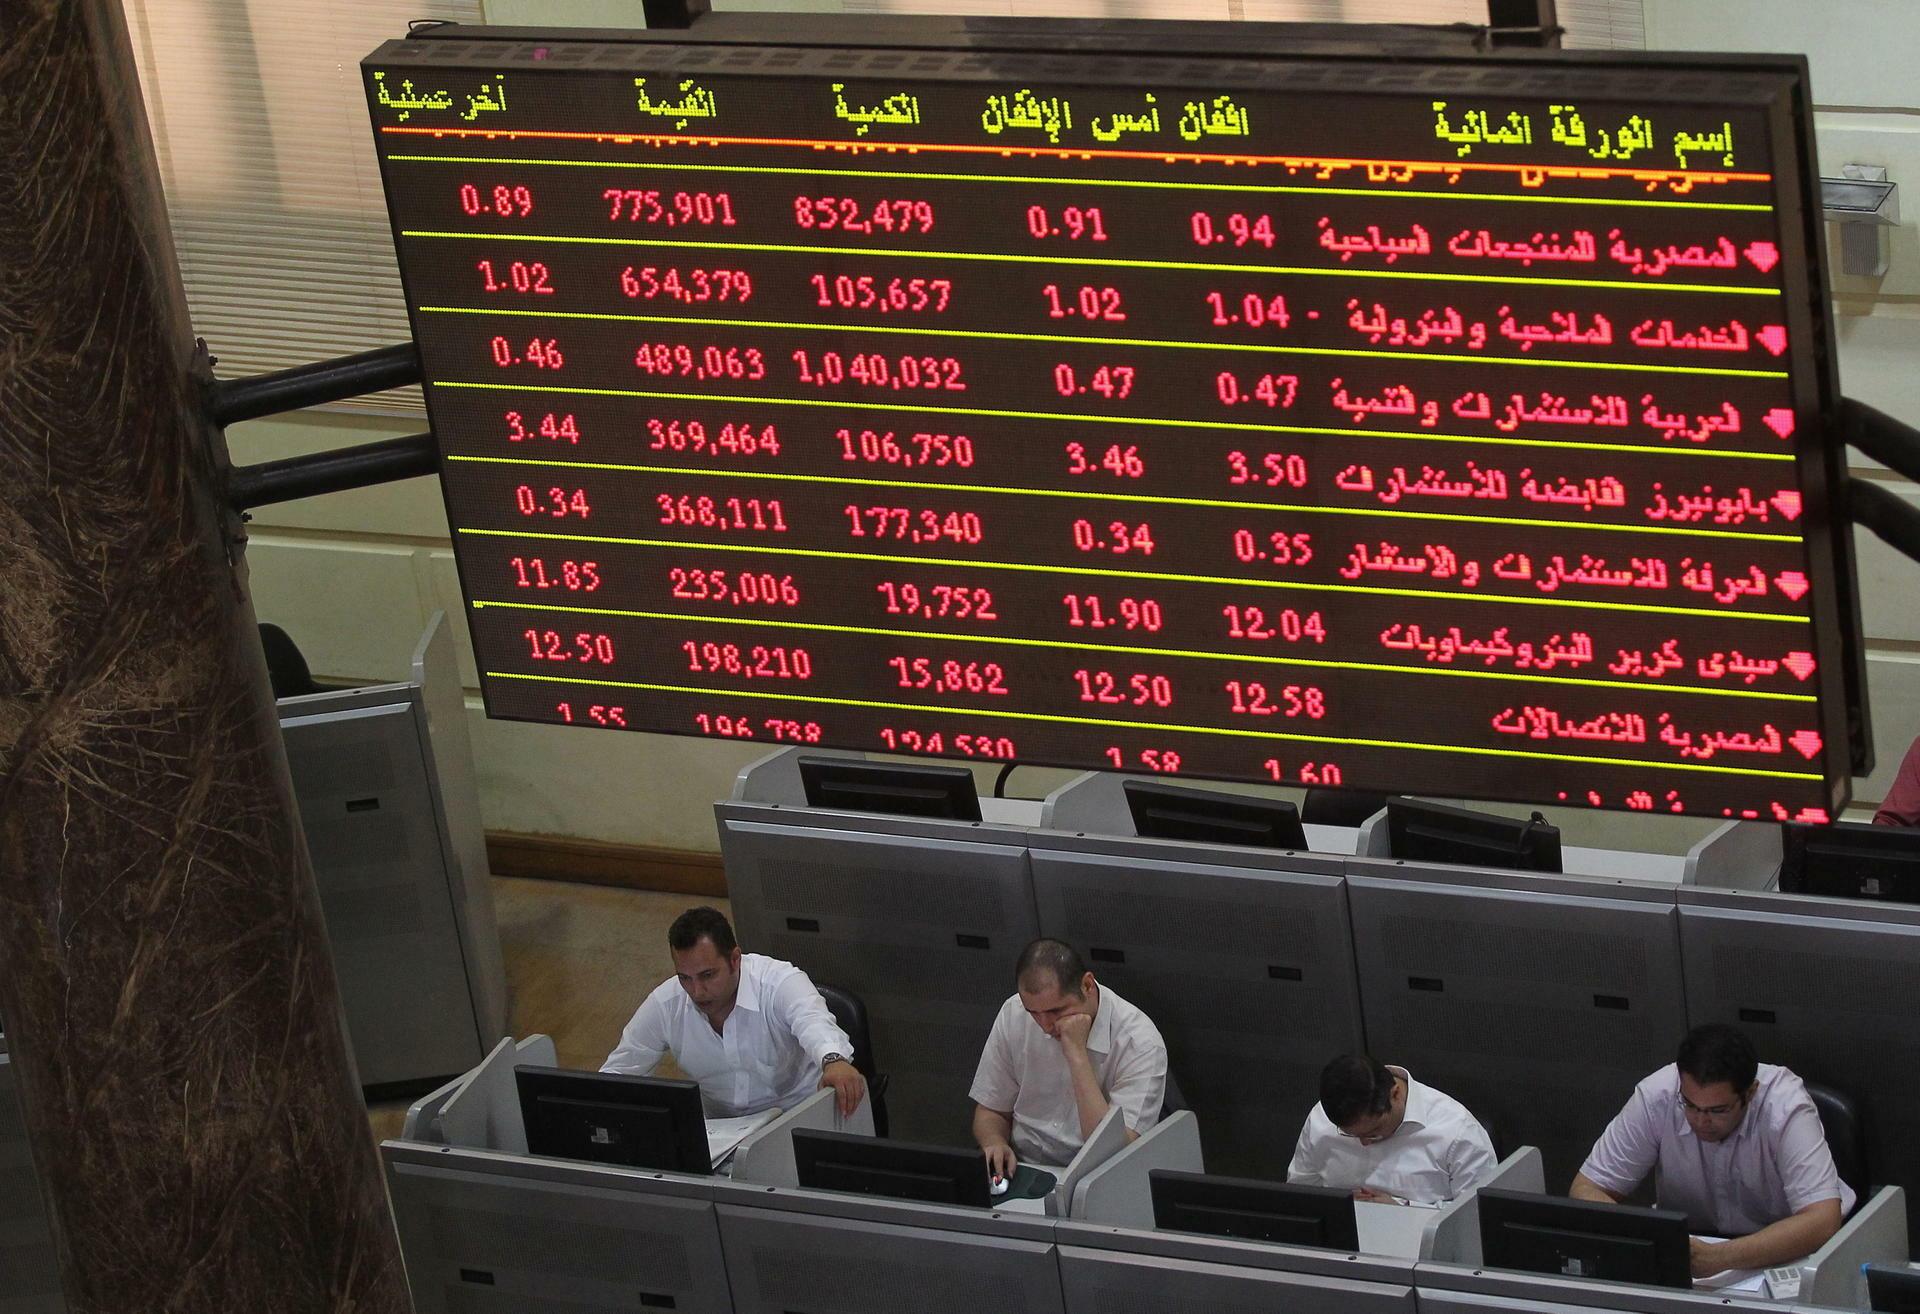 Ägypten: Börse in Kairo knackt weiter Rekorde